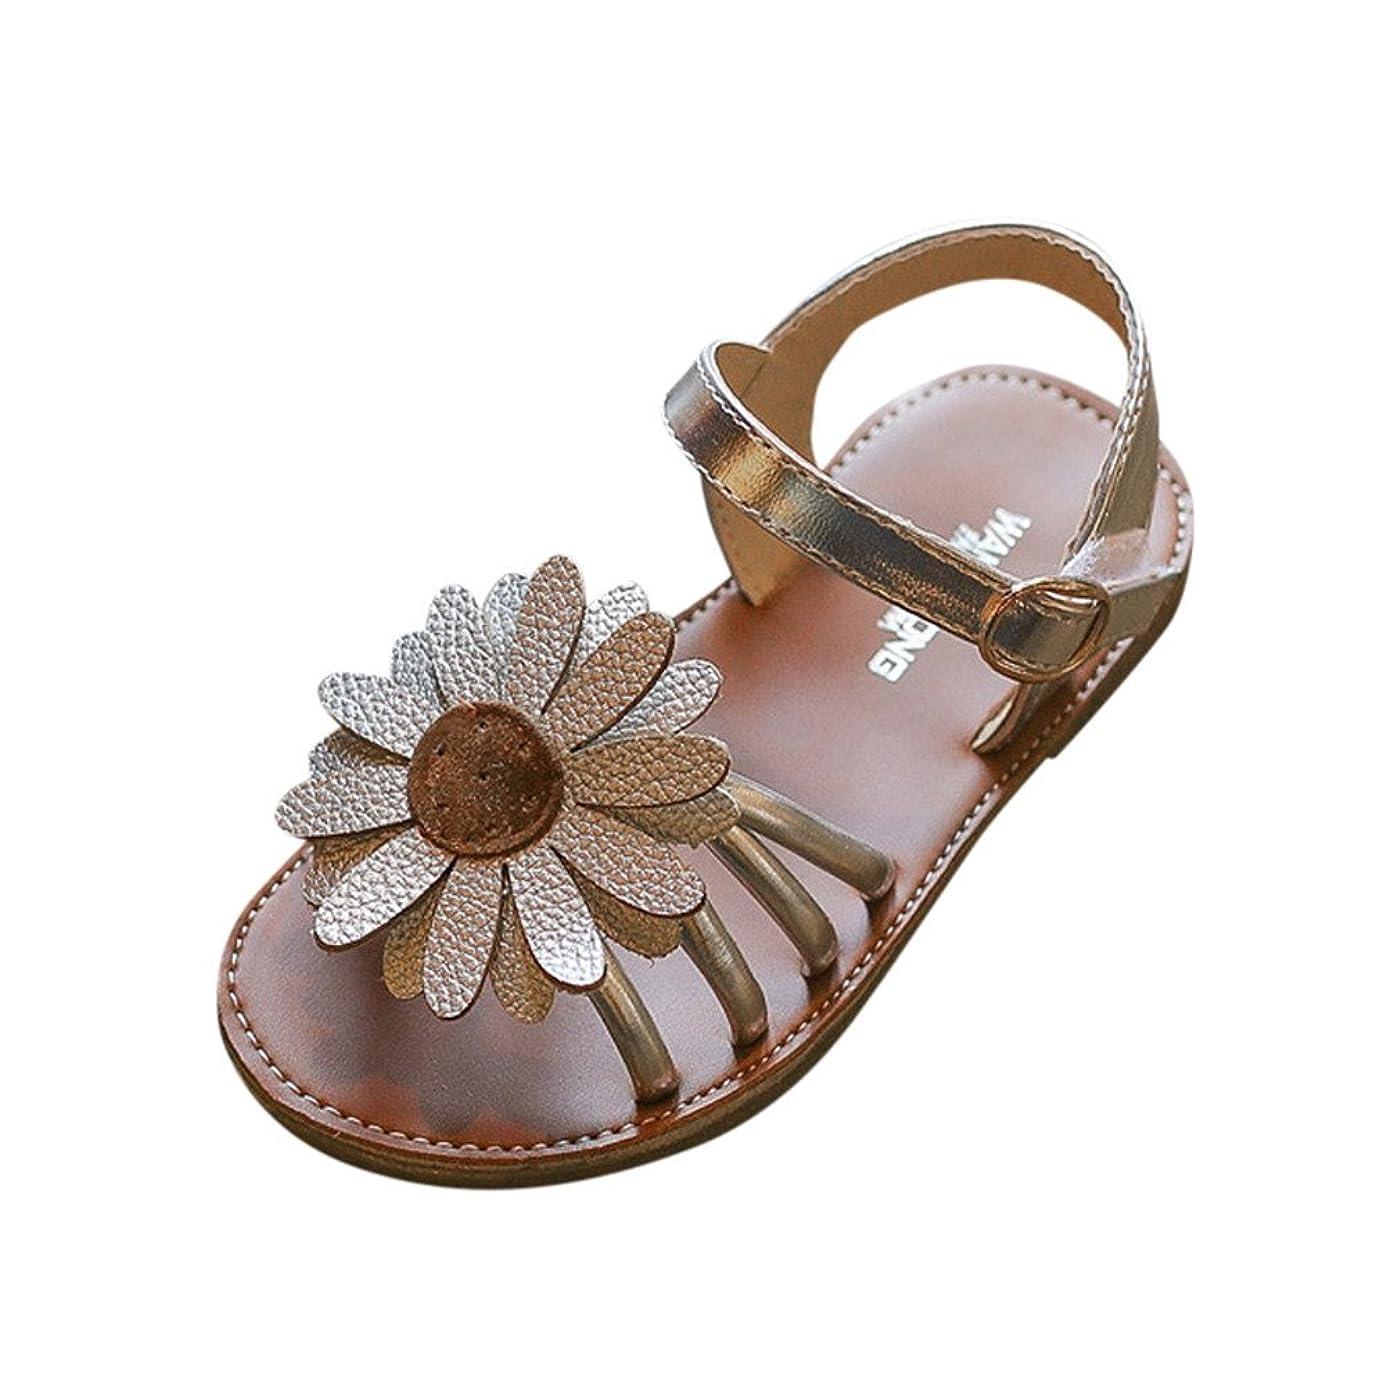 Flower Print Shoes Toddler Kids Roman Sandals ybp3263588